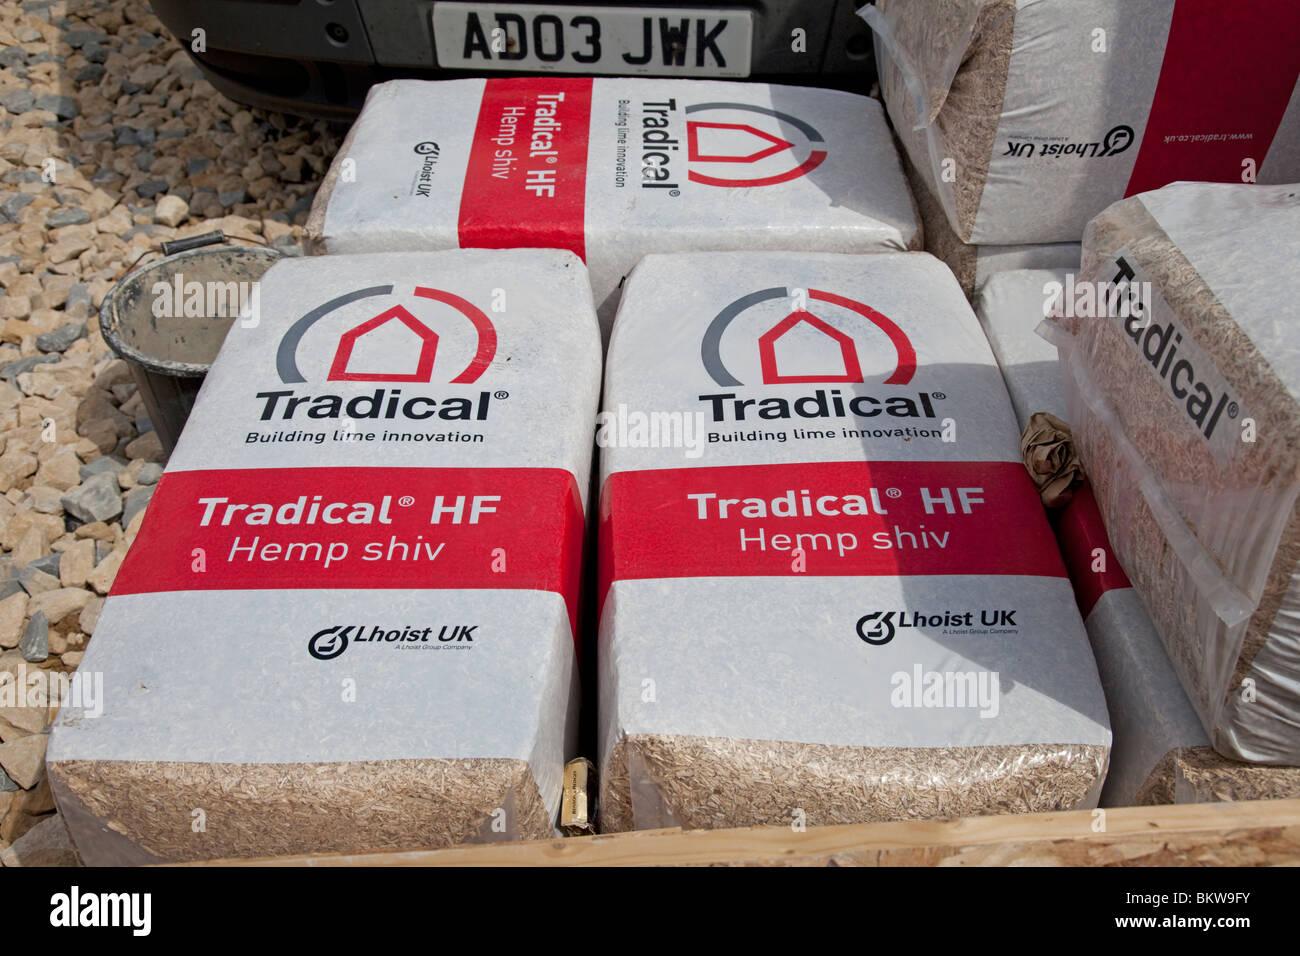 Bales of Tradical Hemp shiv for environmentally friendly building construction UK Stock Photo